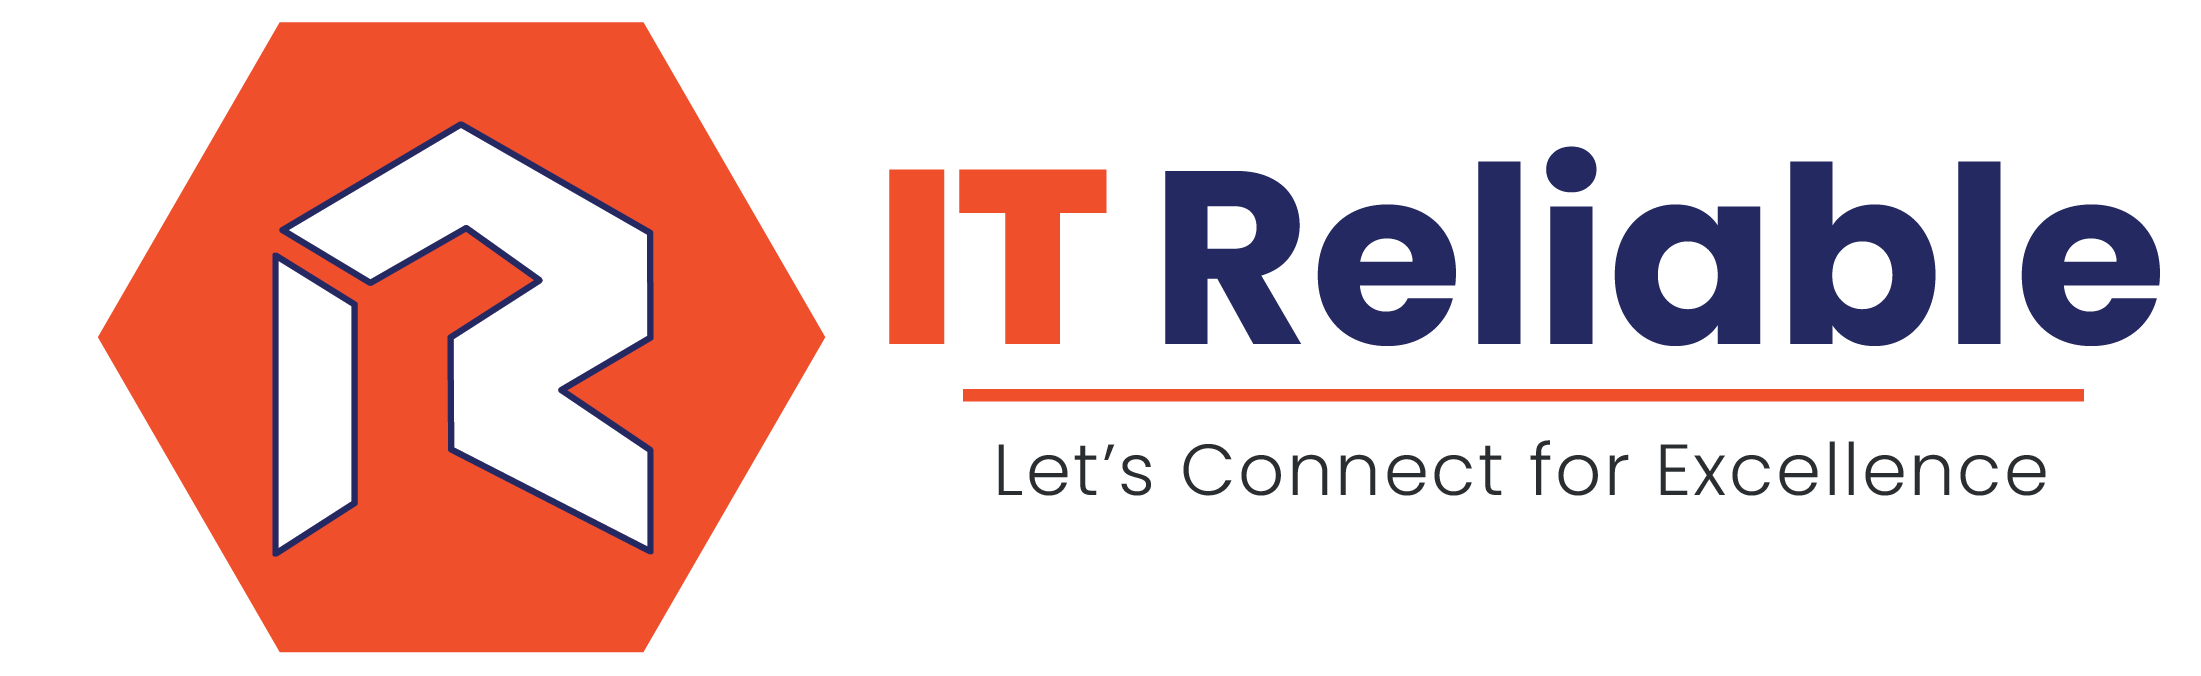 IT Reliable Pty Ltd